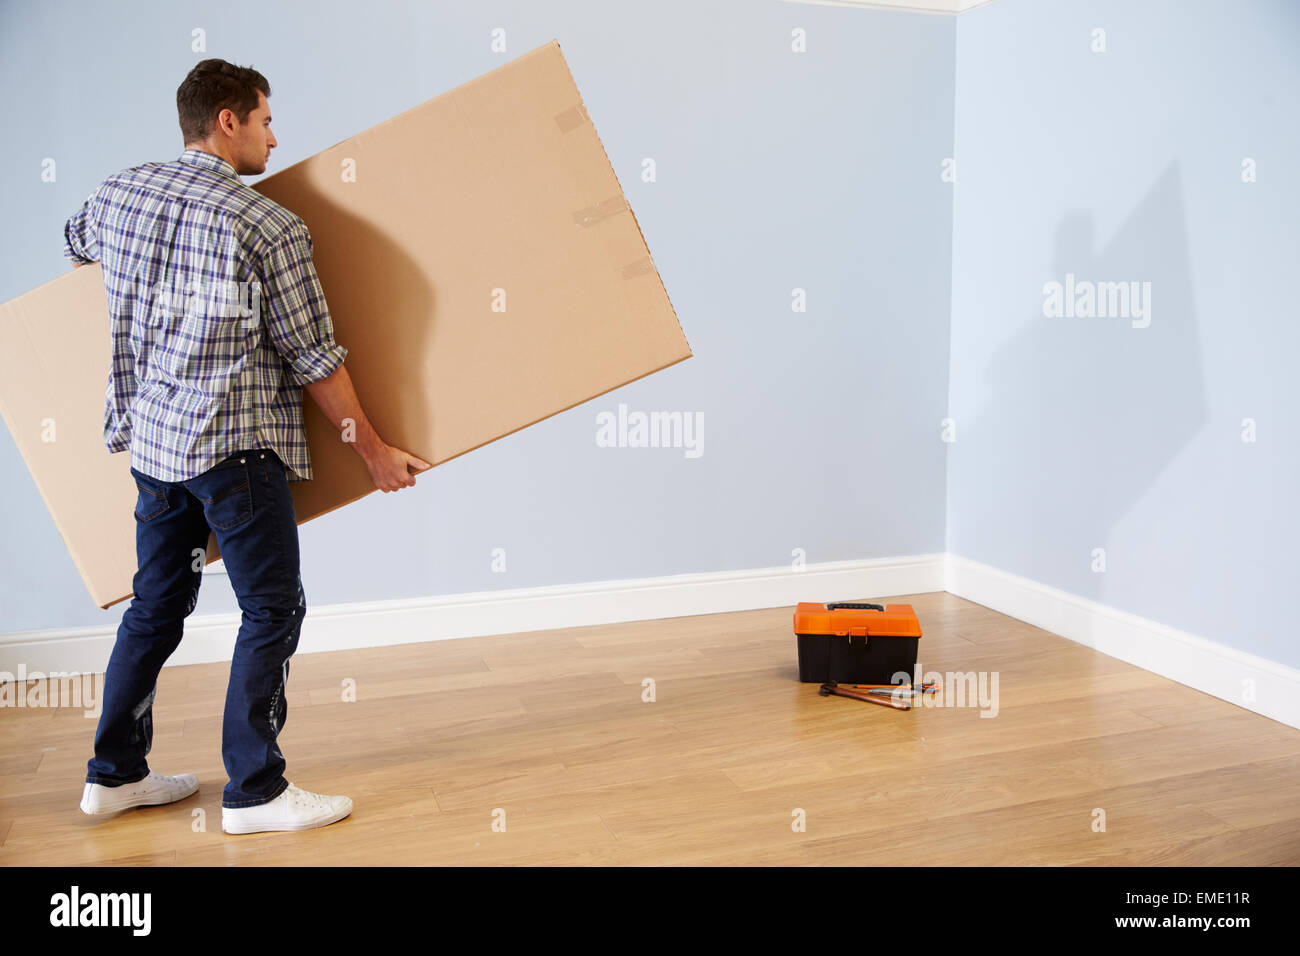 Man Preparing To Assemble Flat Pack Furniture - Stock Image